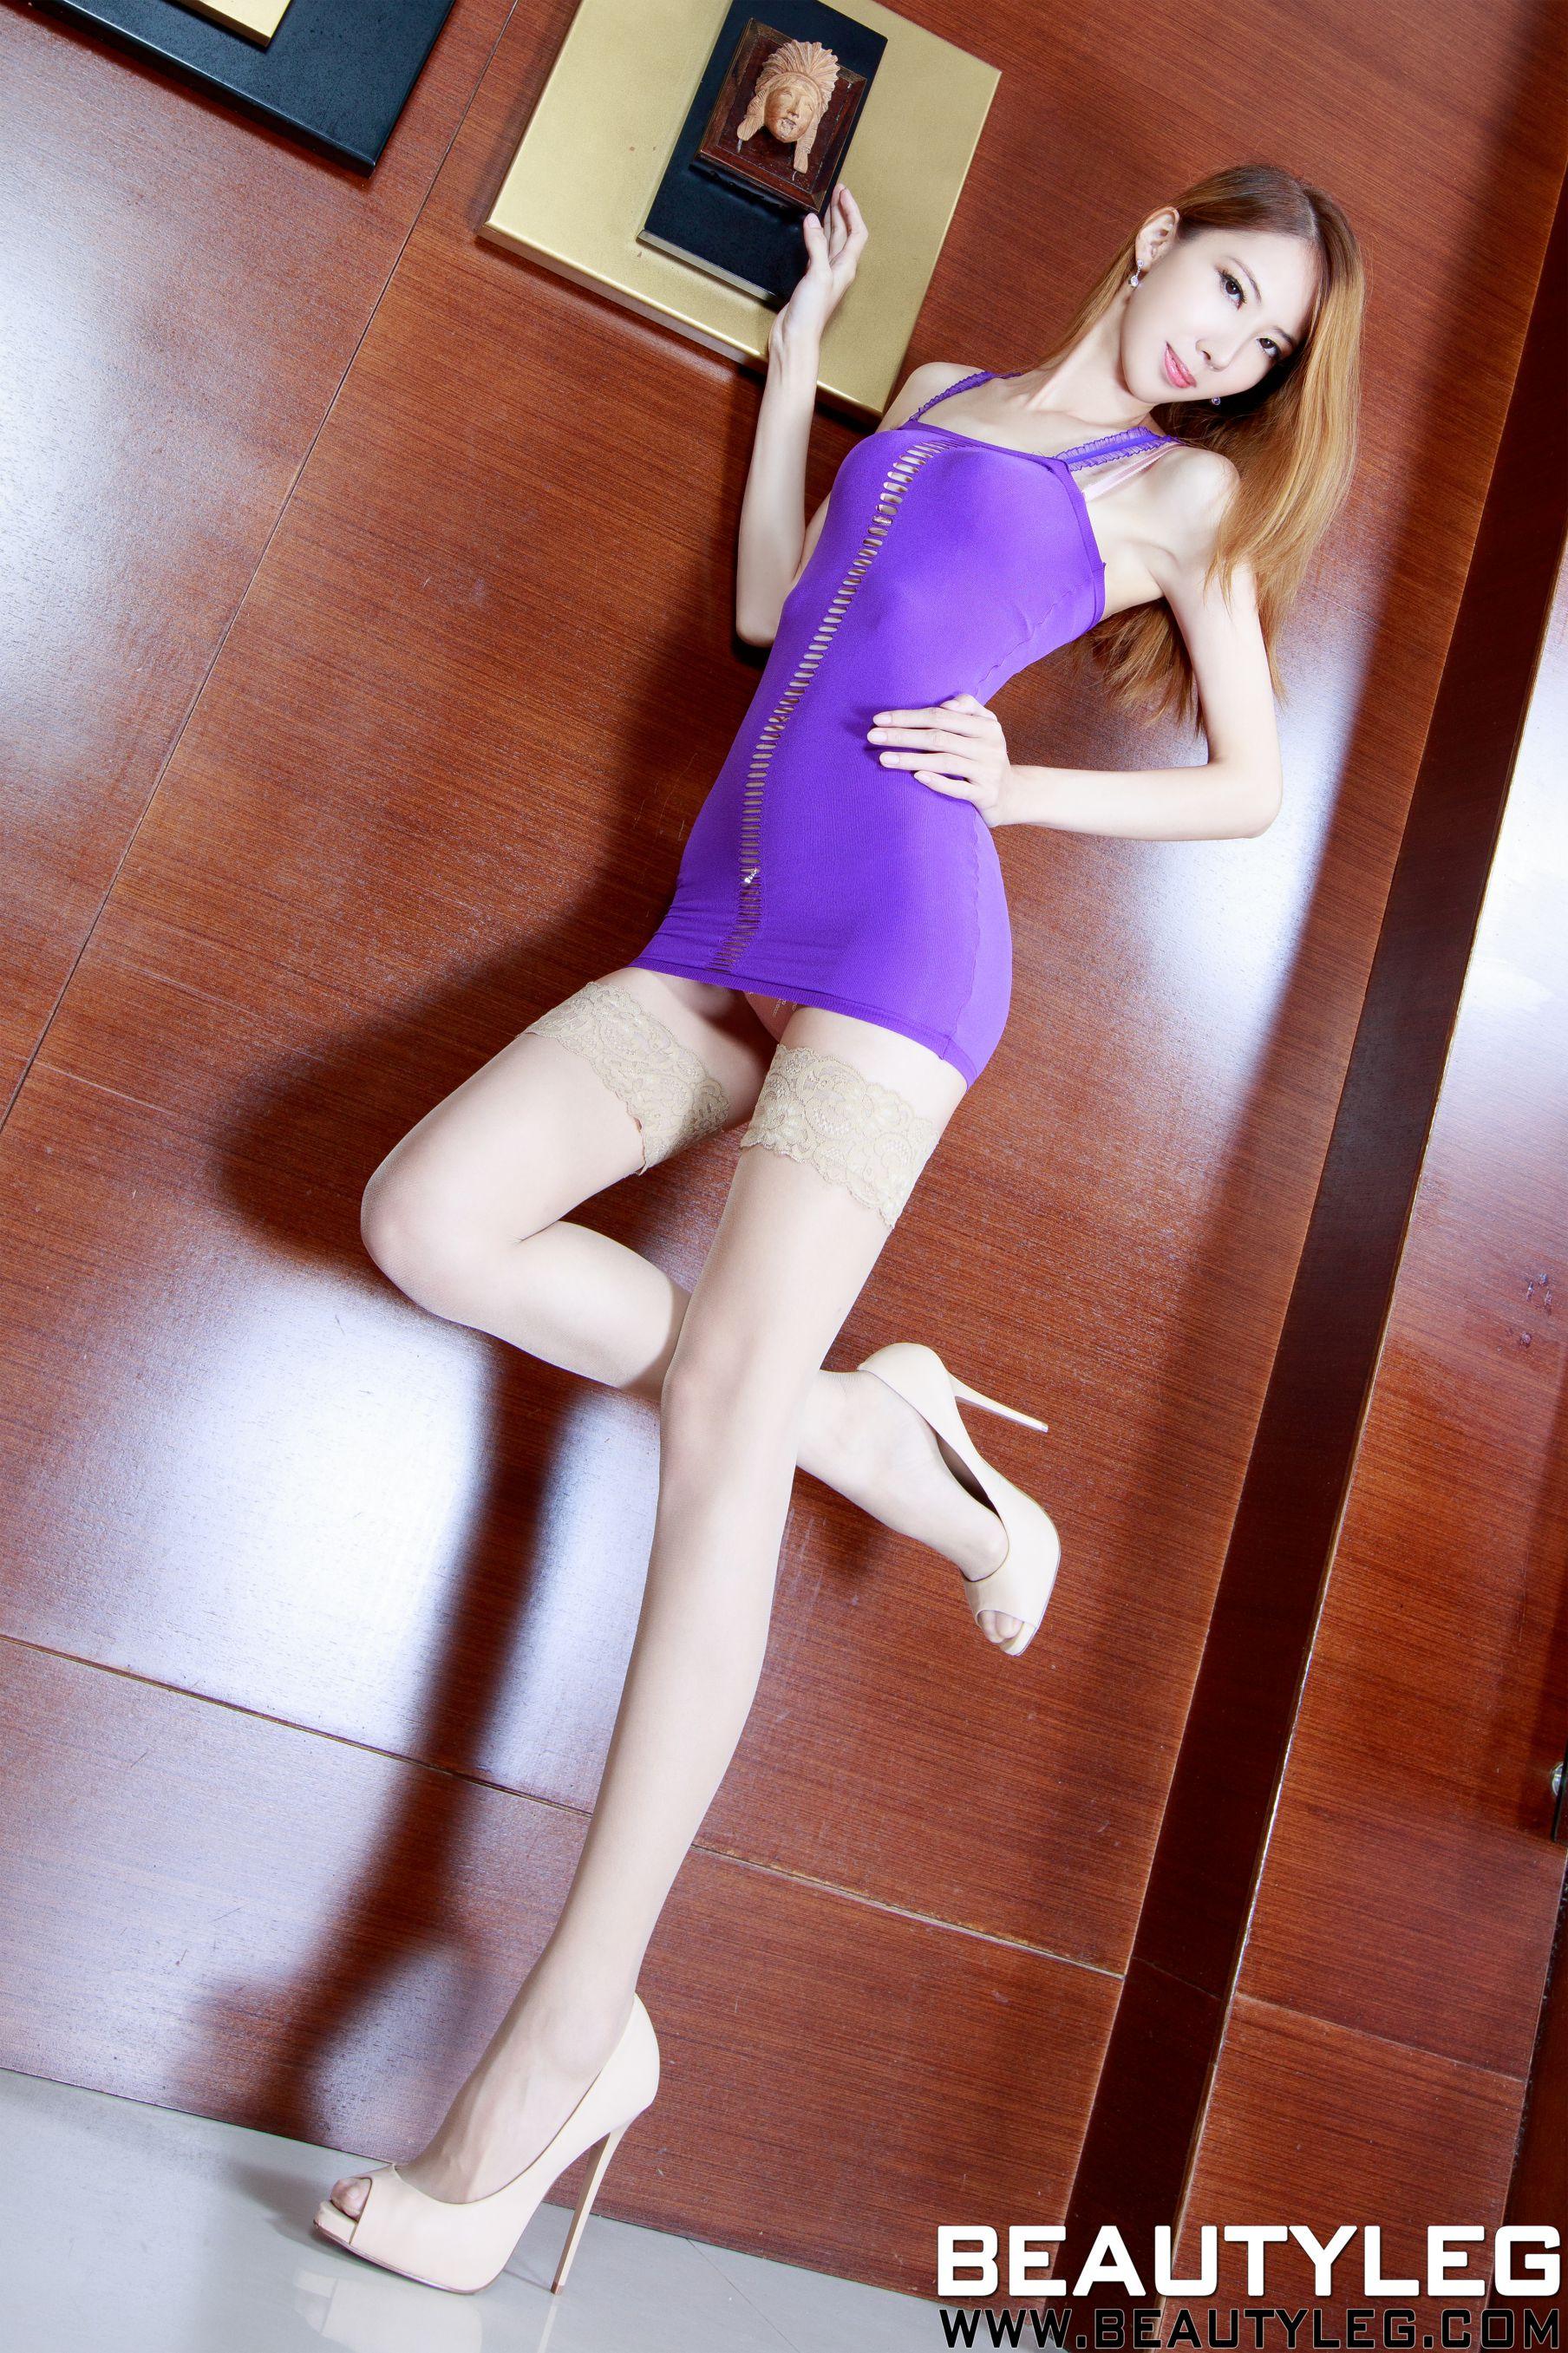 VOL.878 [Beautyleg]吊带丝袜高跟美腿:童采萱(Beautyleg Yoyo,腿模Yoyo)高品质写真套图(53P)